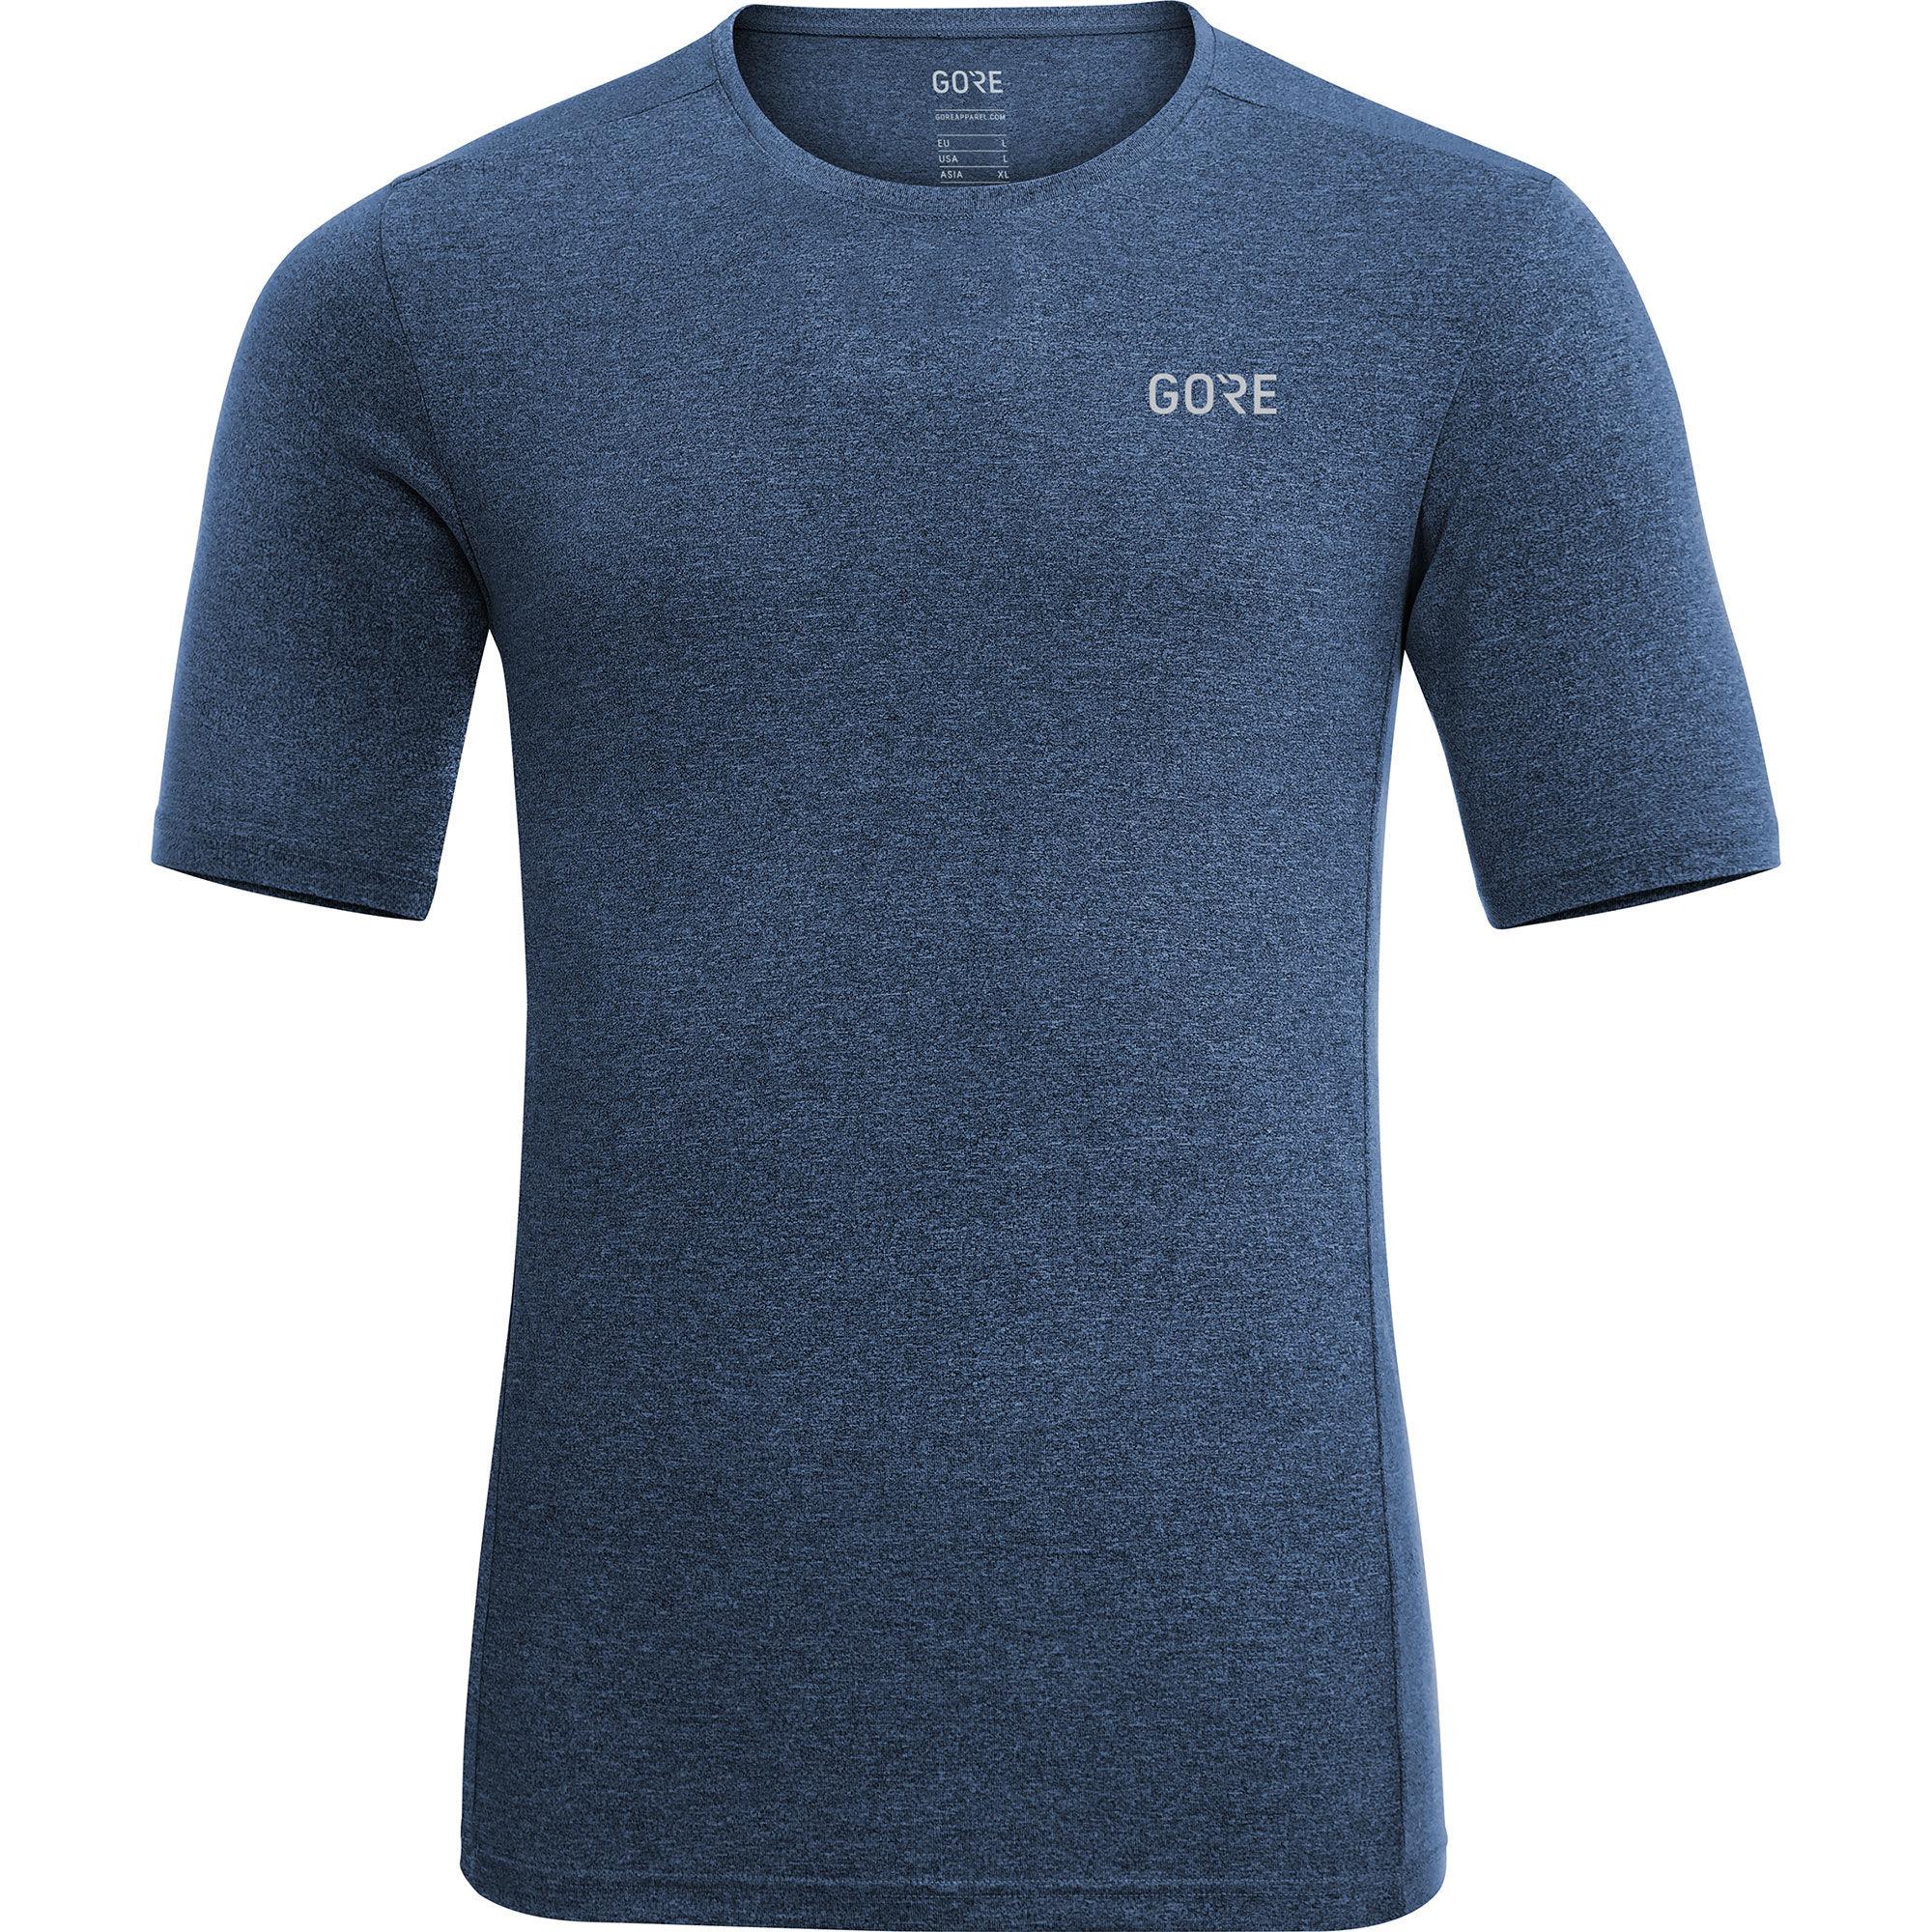 Gore R3 Shirt Melange in Blau